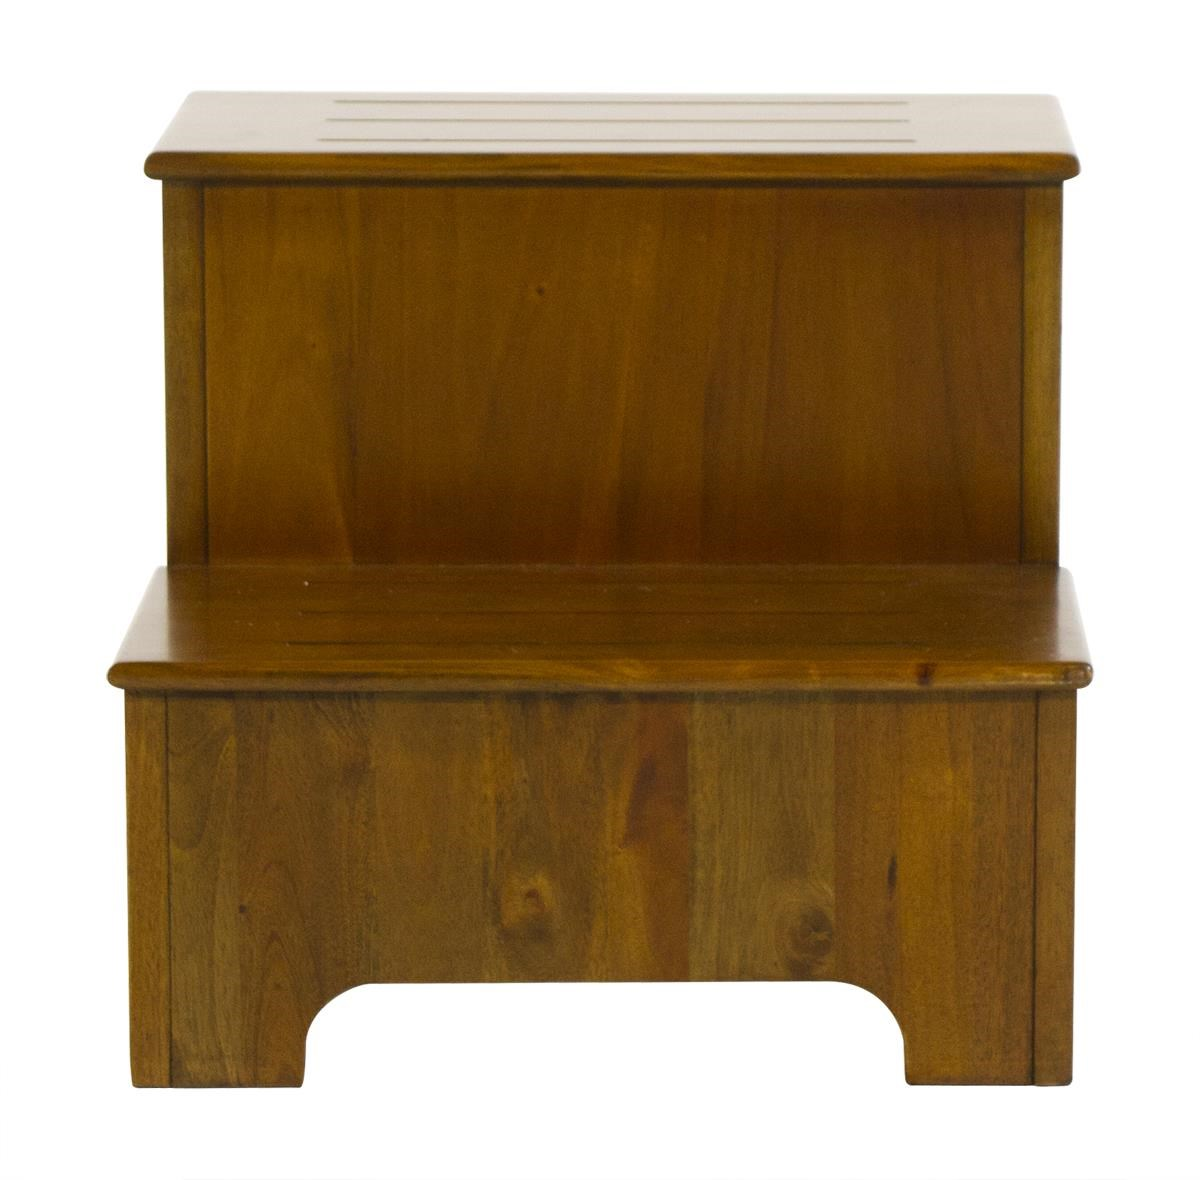 Napa Furniture Designs Boston Brownstone Step Stool - Item Number: 21-15